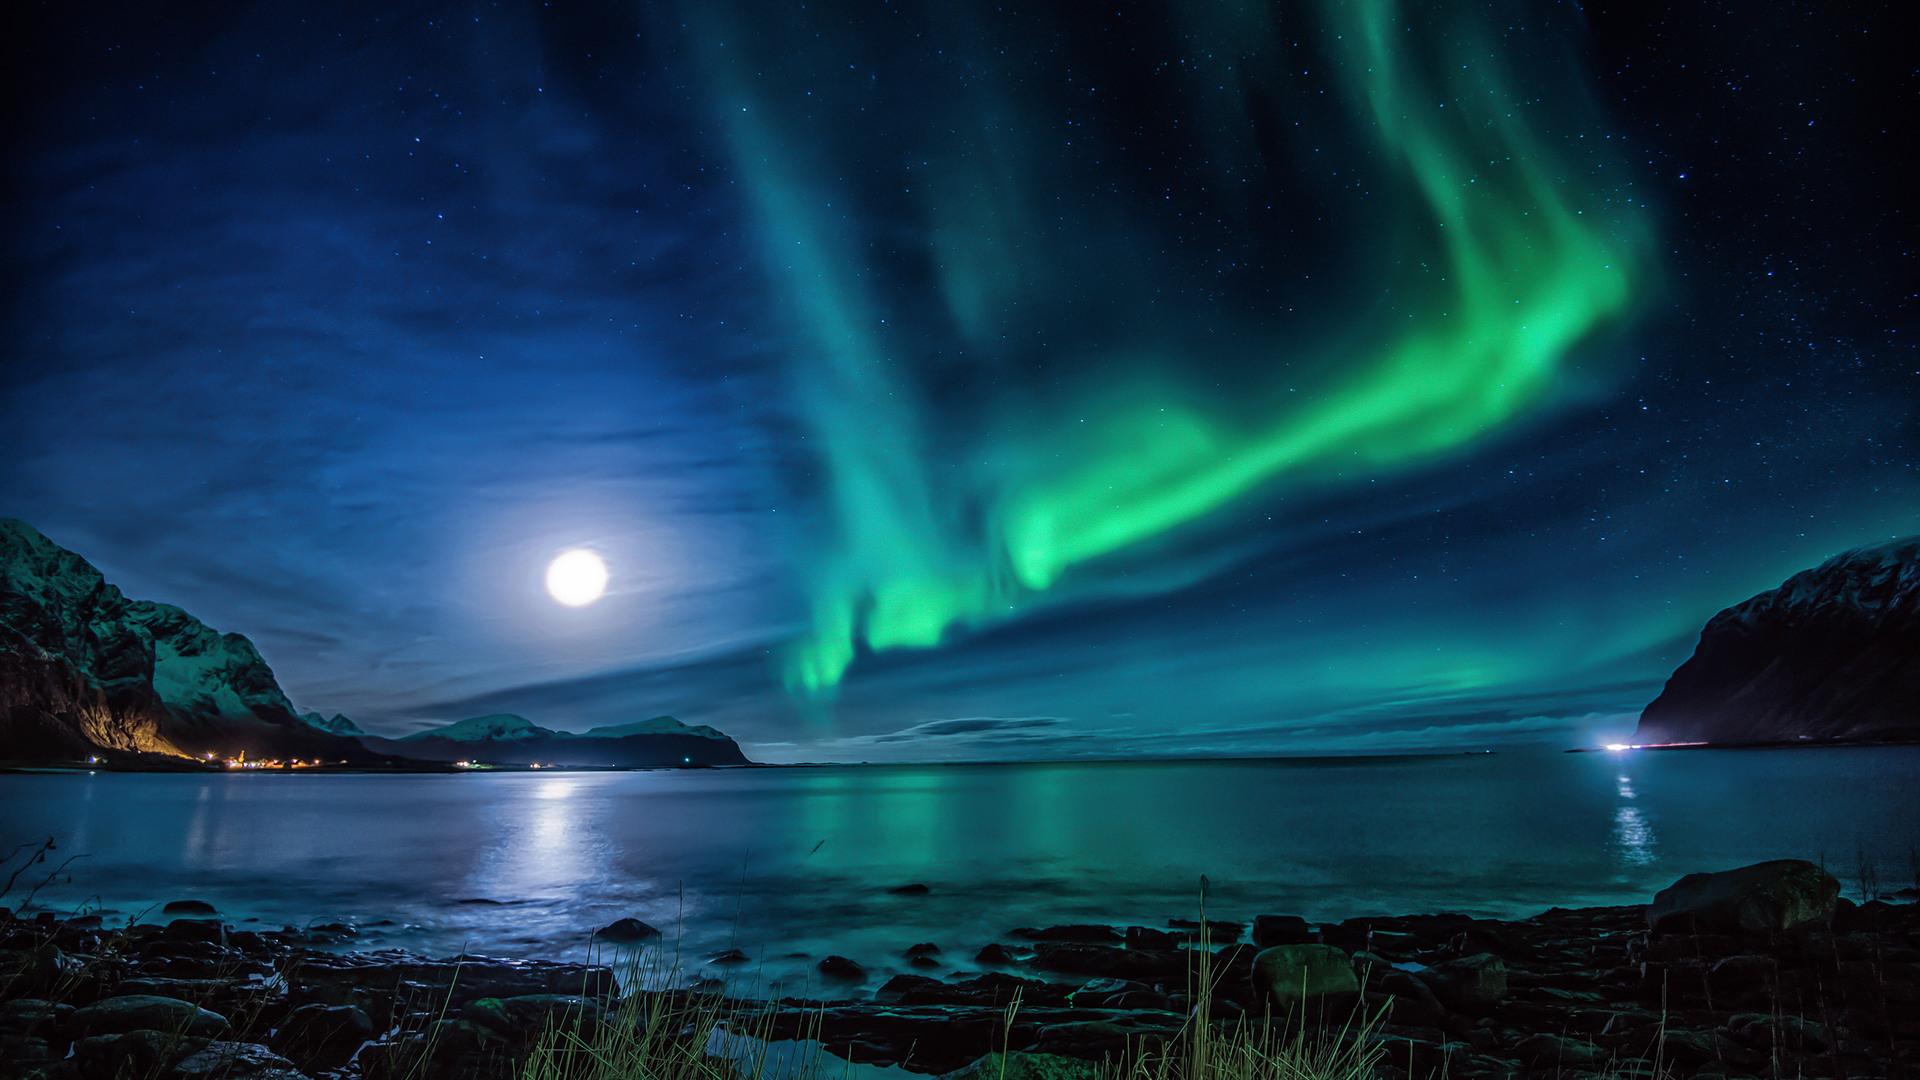 1920x1080 Aurora Borealis Moon Night Laptop Full HD 1080P